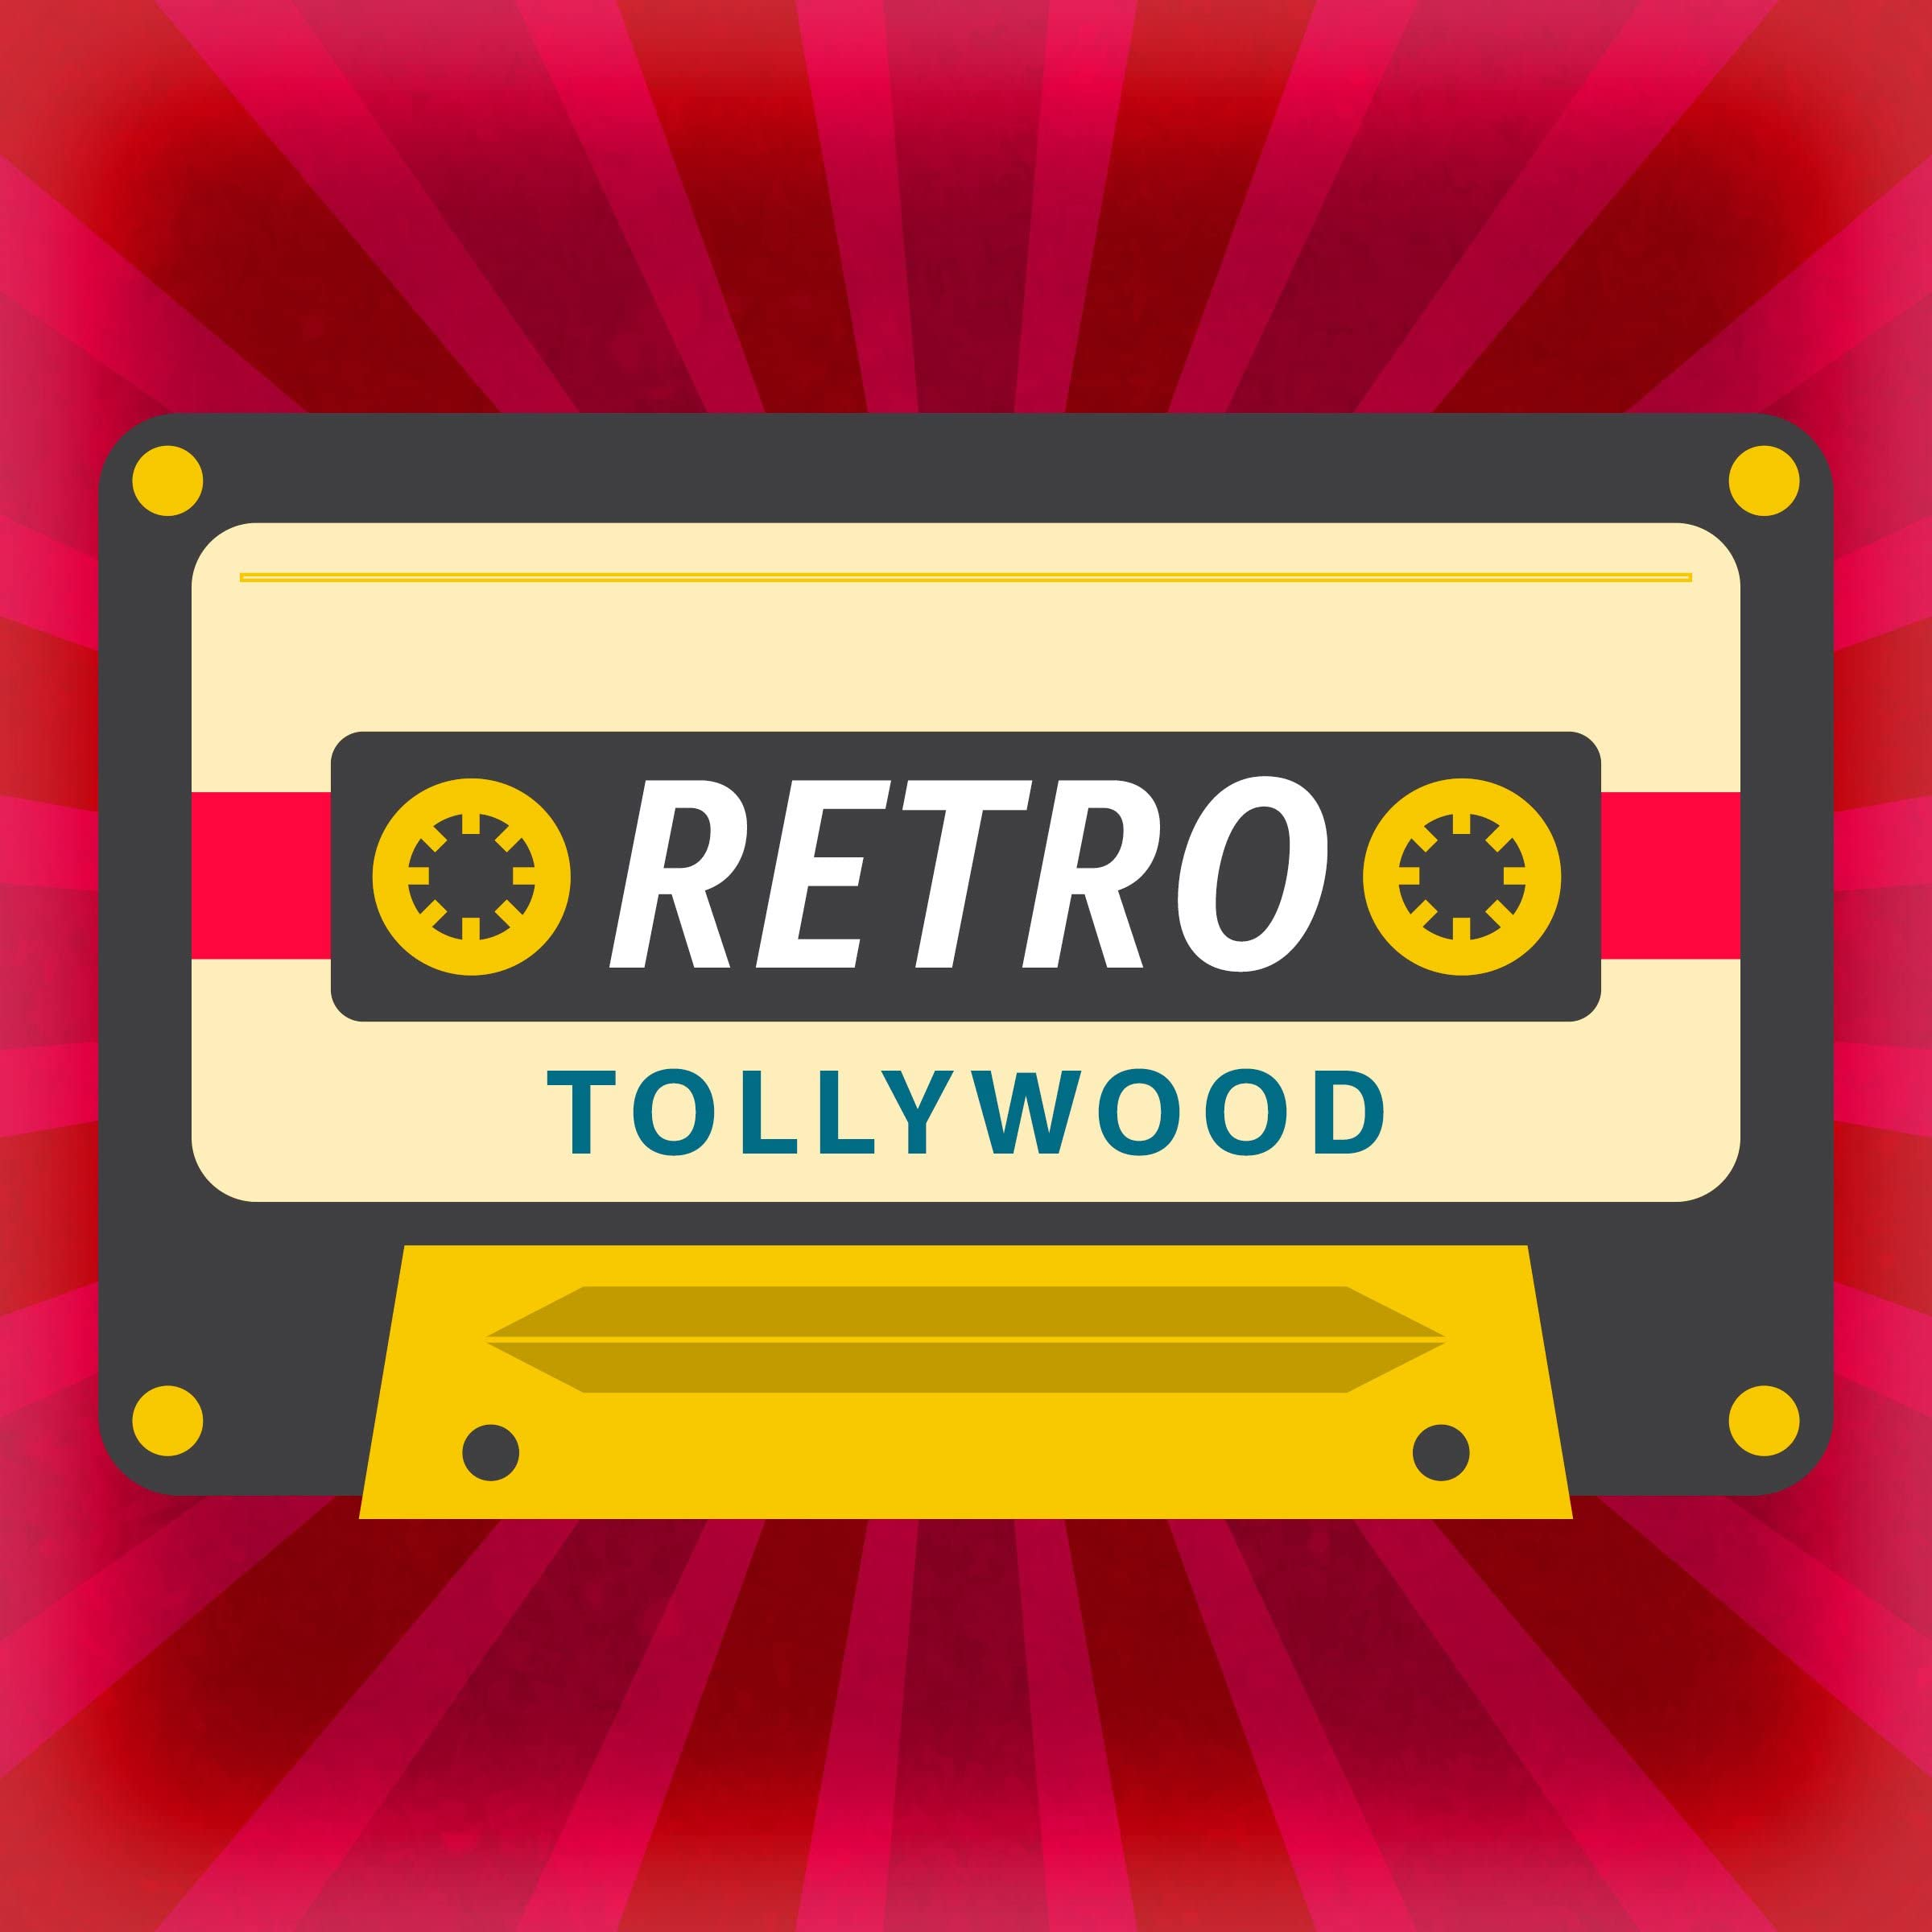 Retro Tollywood